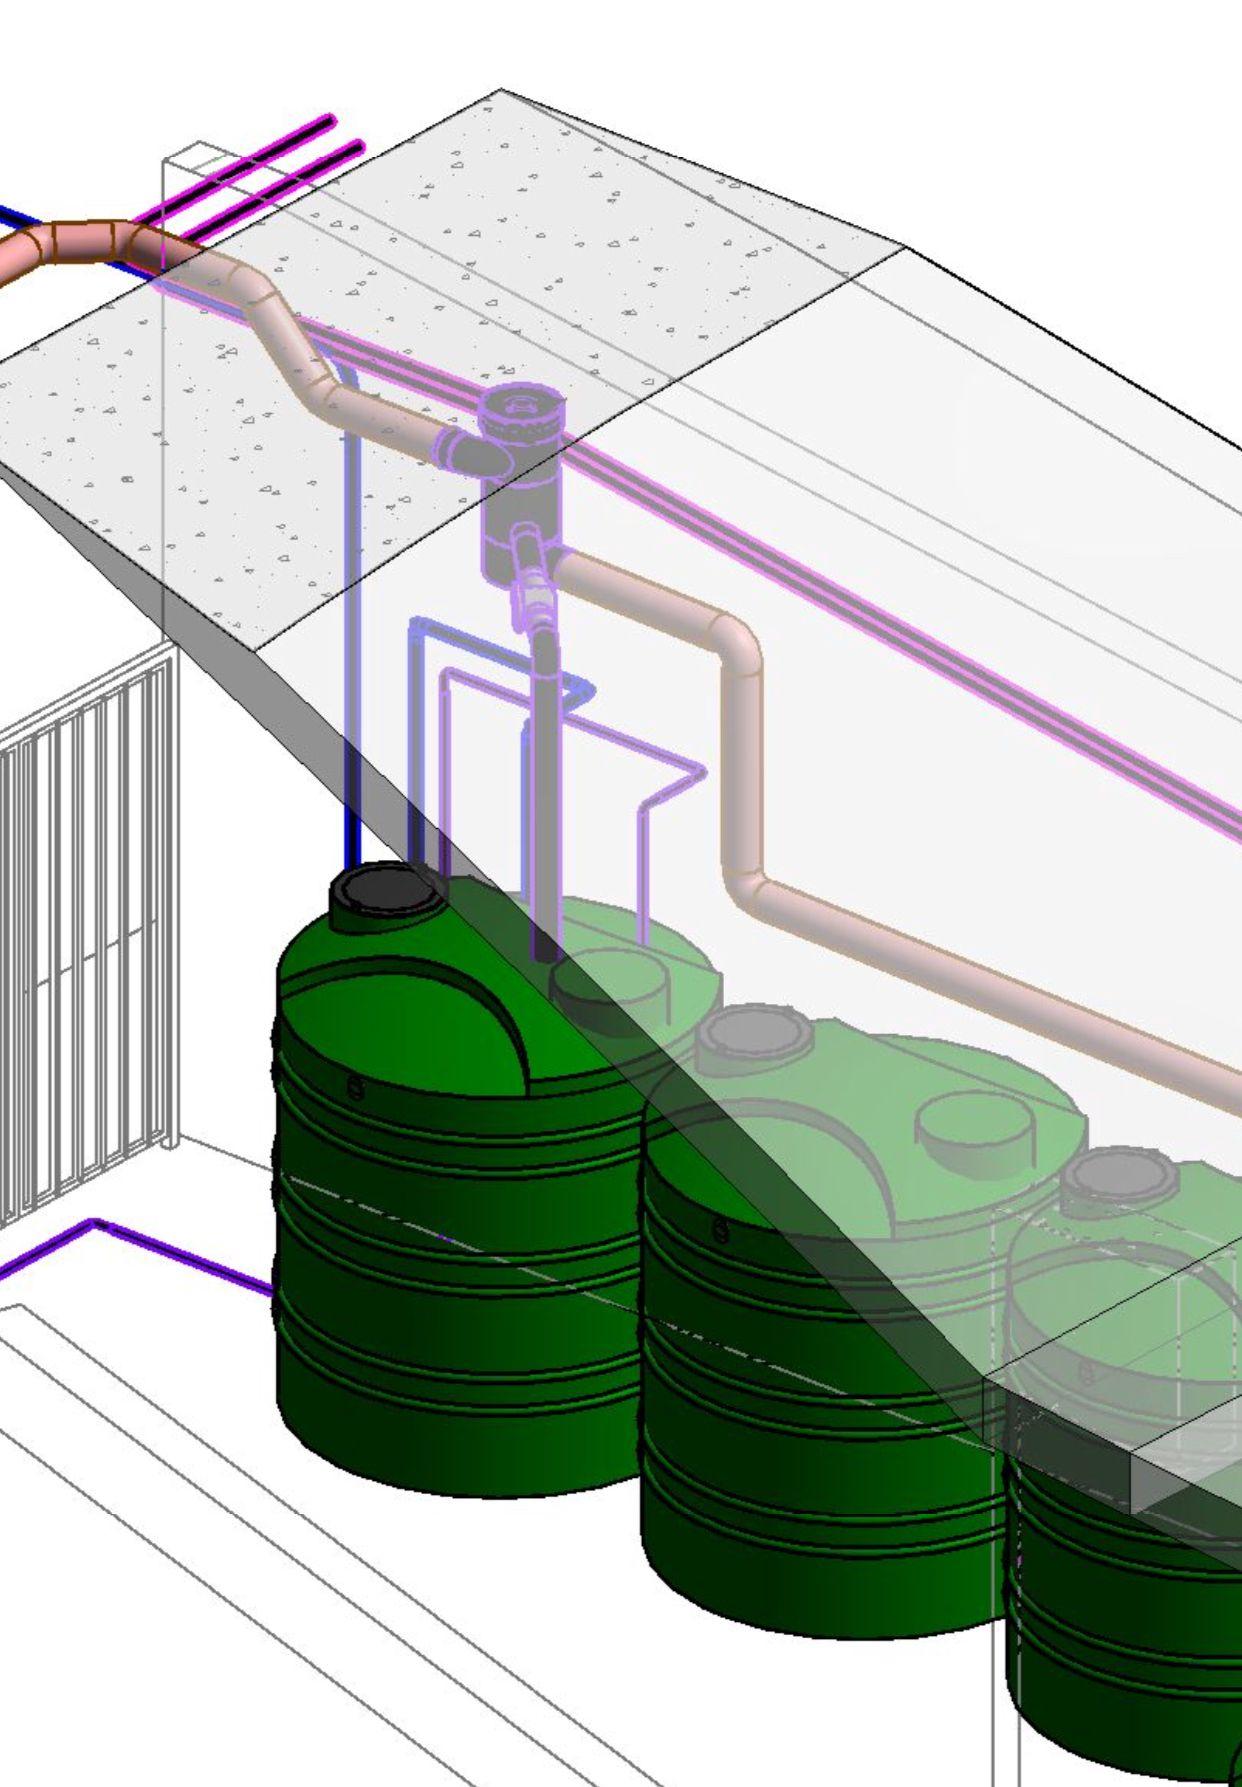 Rainwater harvesting system installations